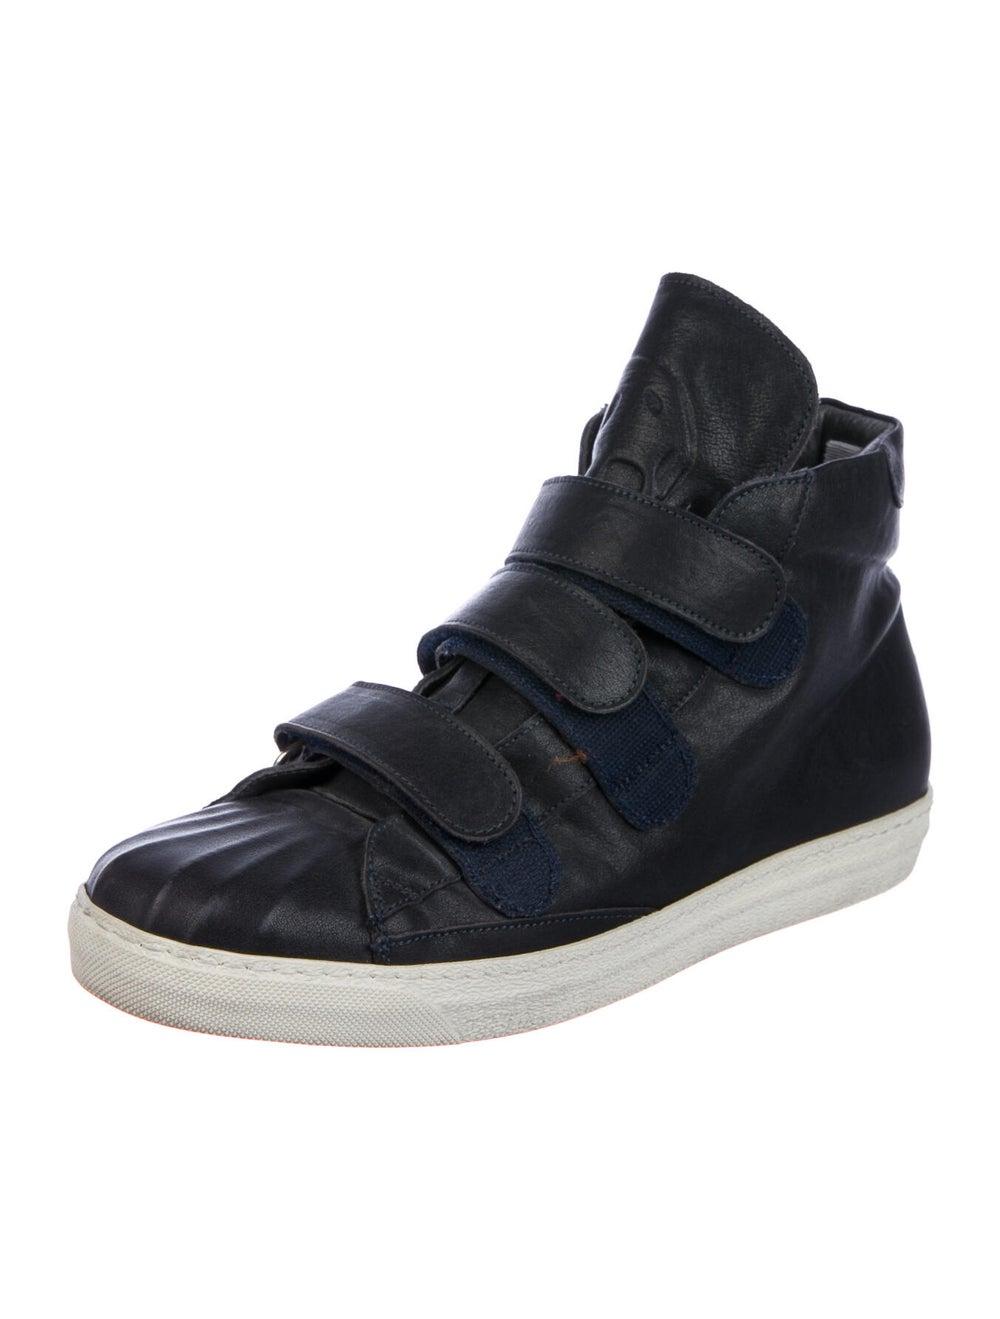 Alexander McQueen Leather Sneakers Blue - image 2